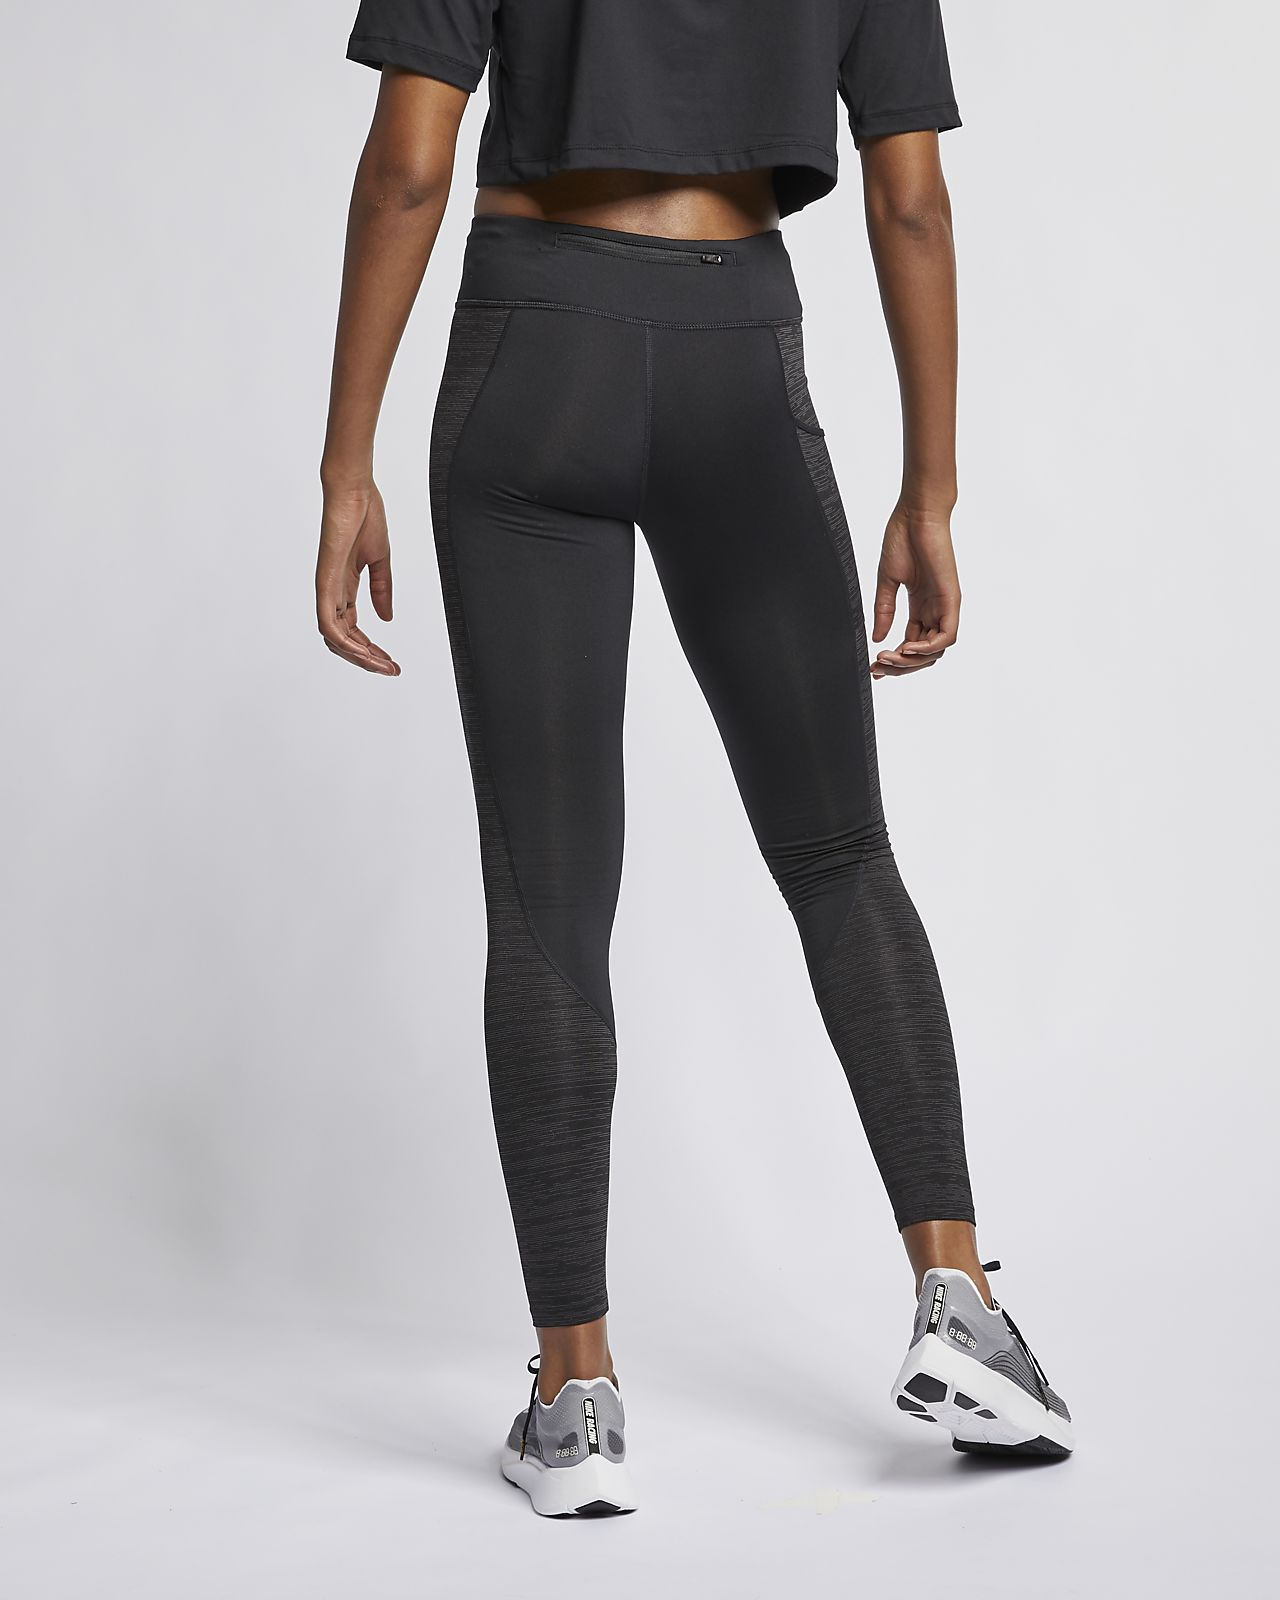 Nike Racer Malles càlides de running - Dona